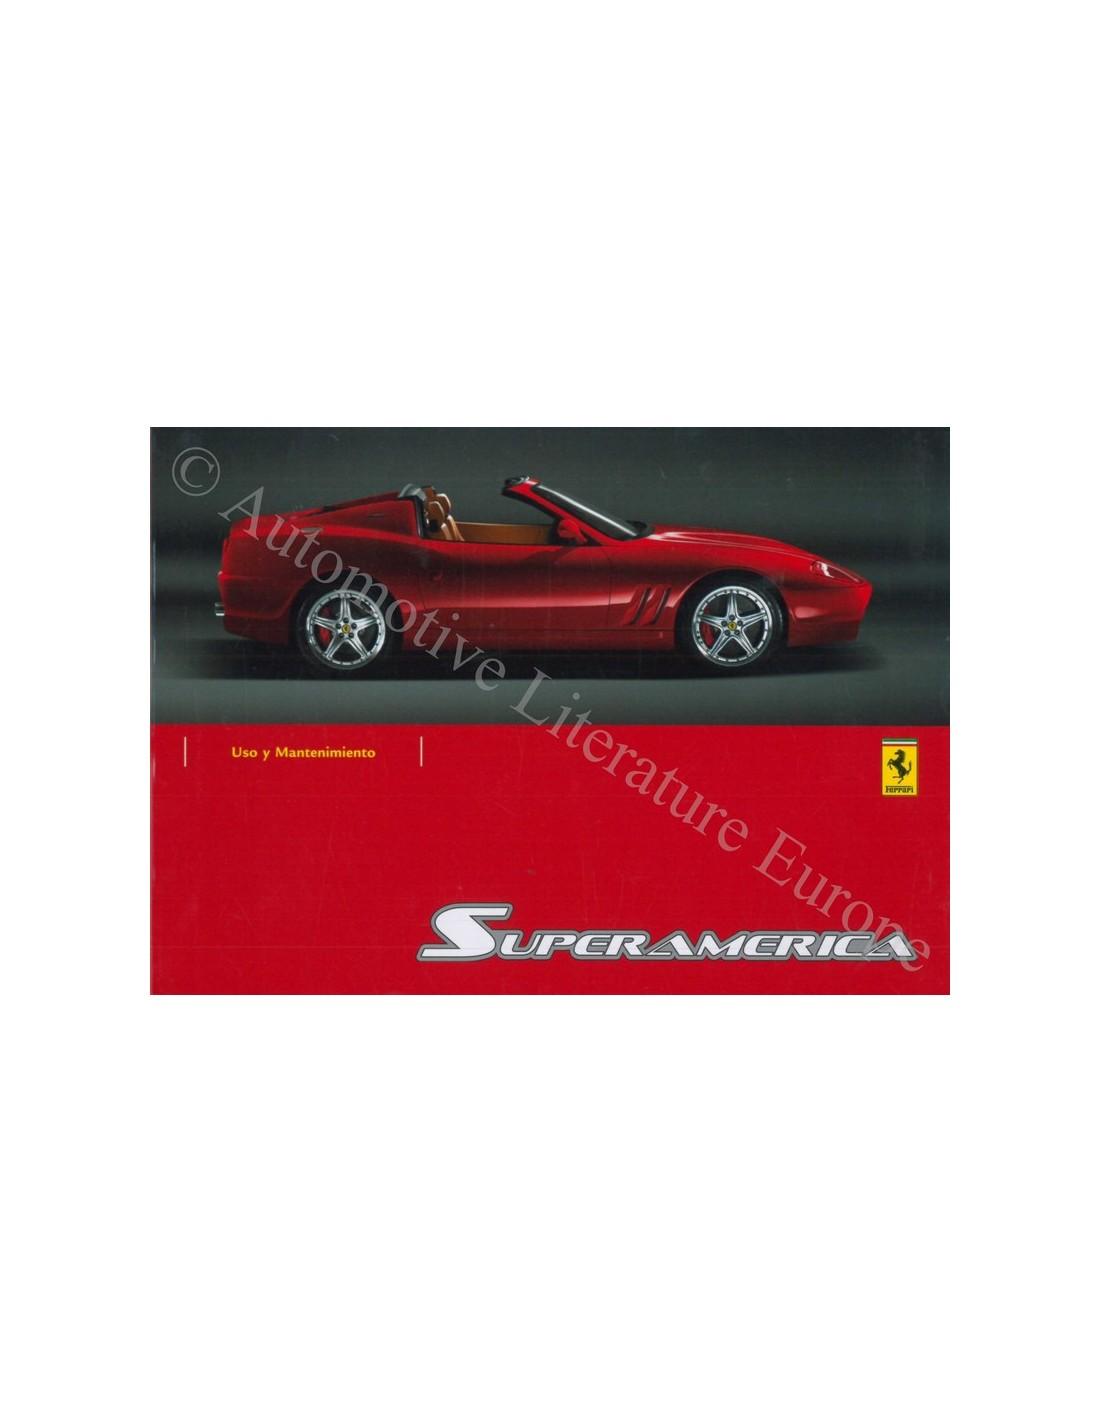 Ferrari Repair Manuals: 2005 FERRARI 575 SUPERAMERICA OWNER'S MANUAL SPANISH